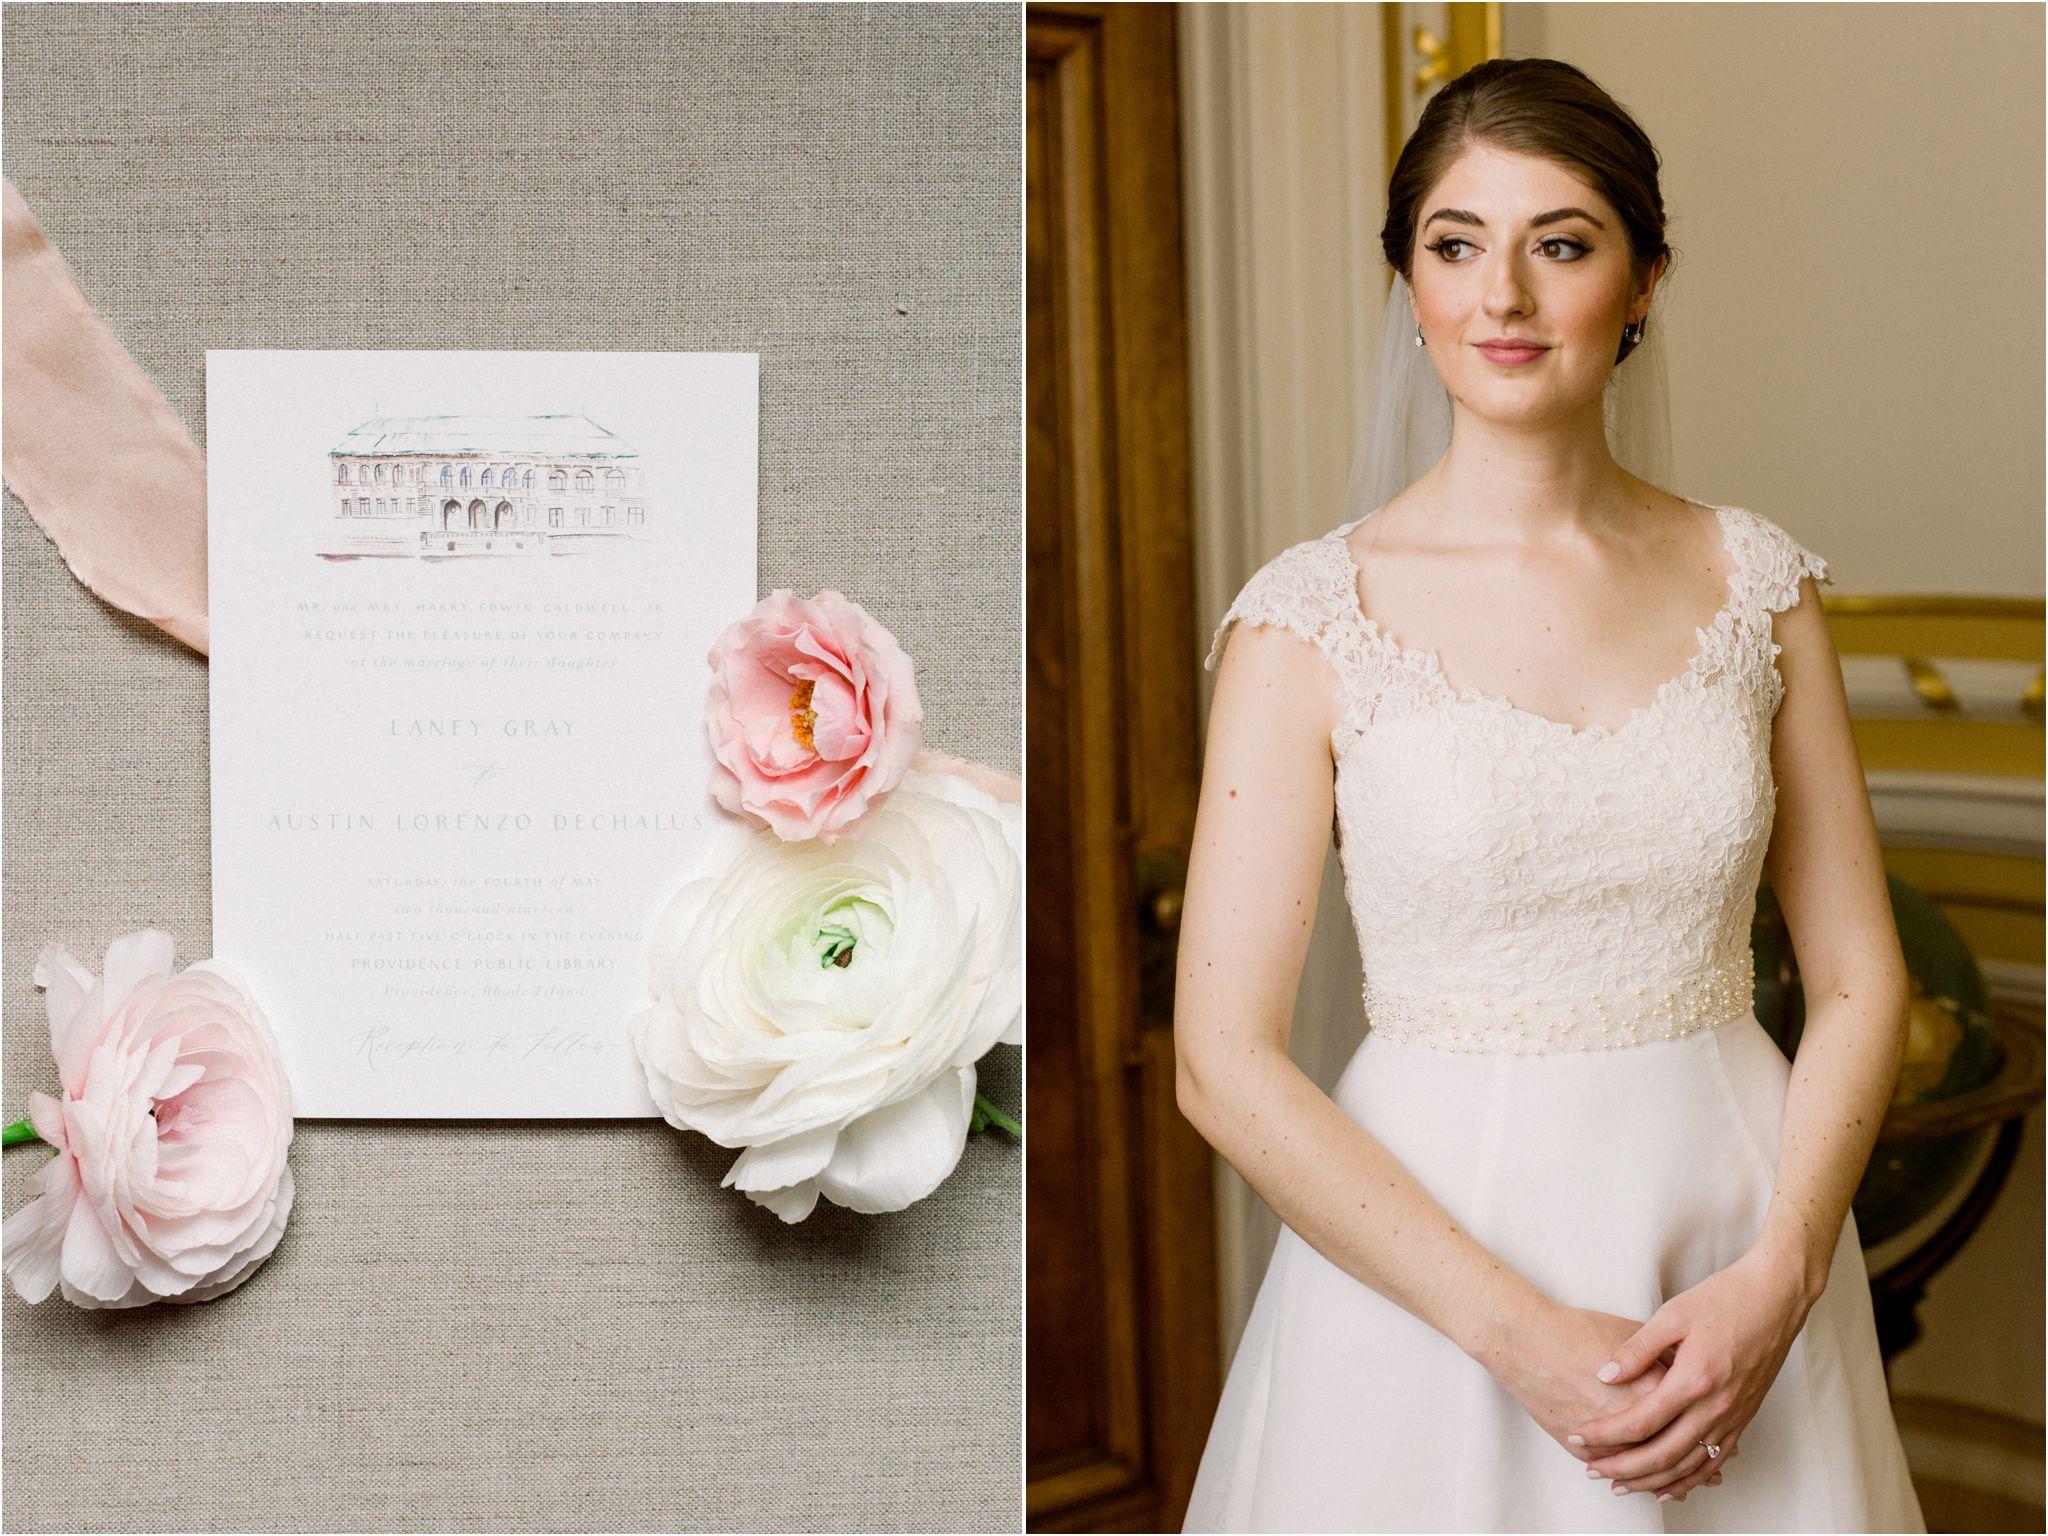 providence-public-library-wedding-images_00005.JPG